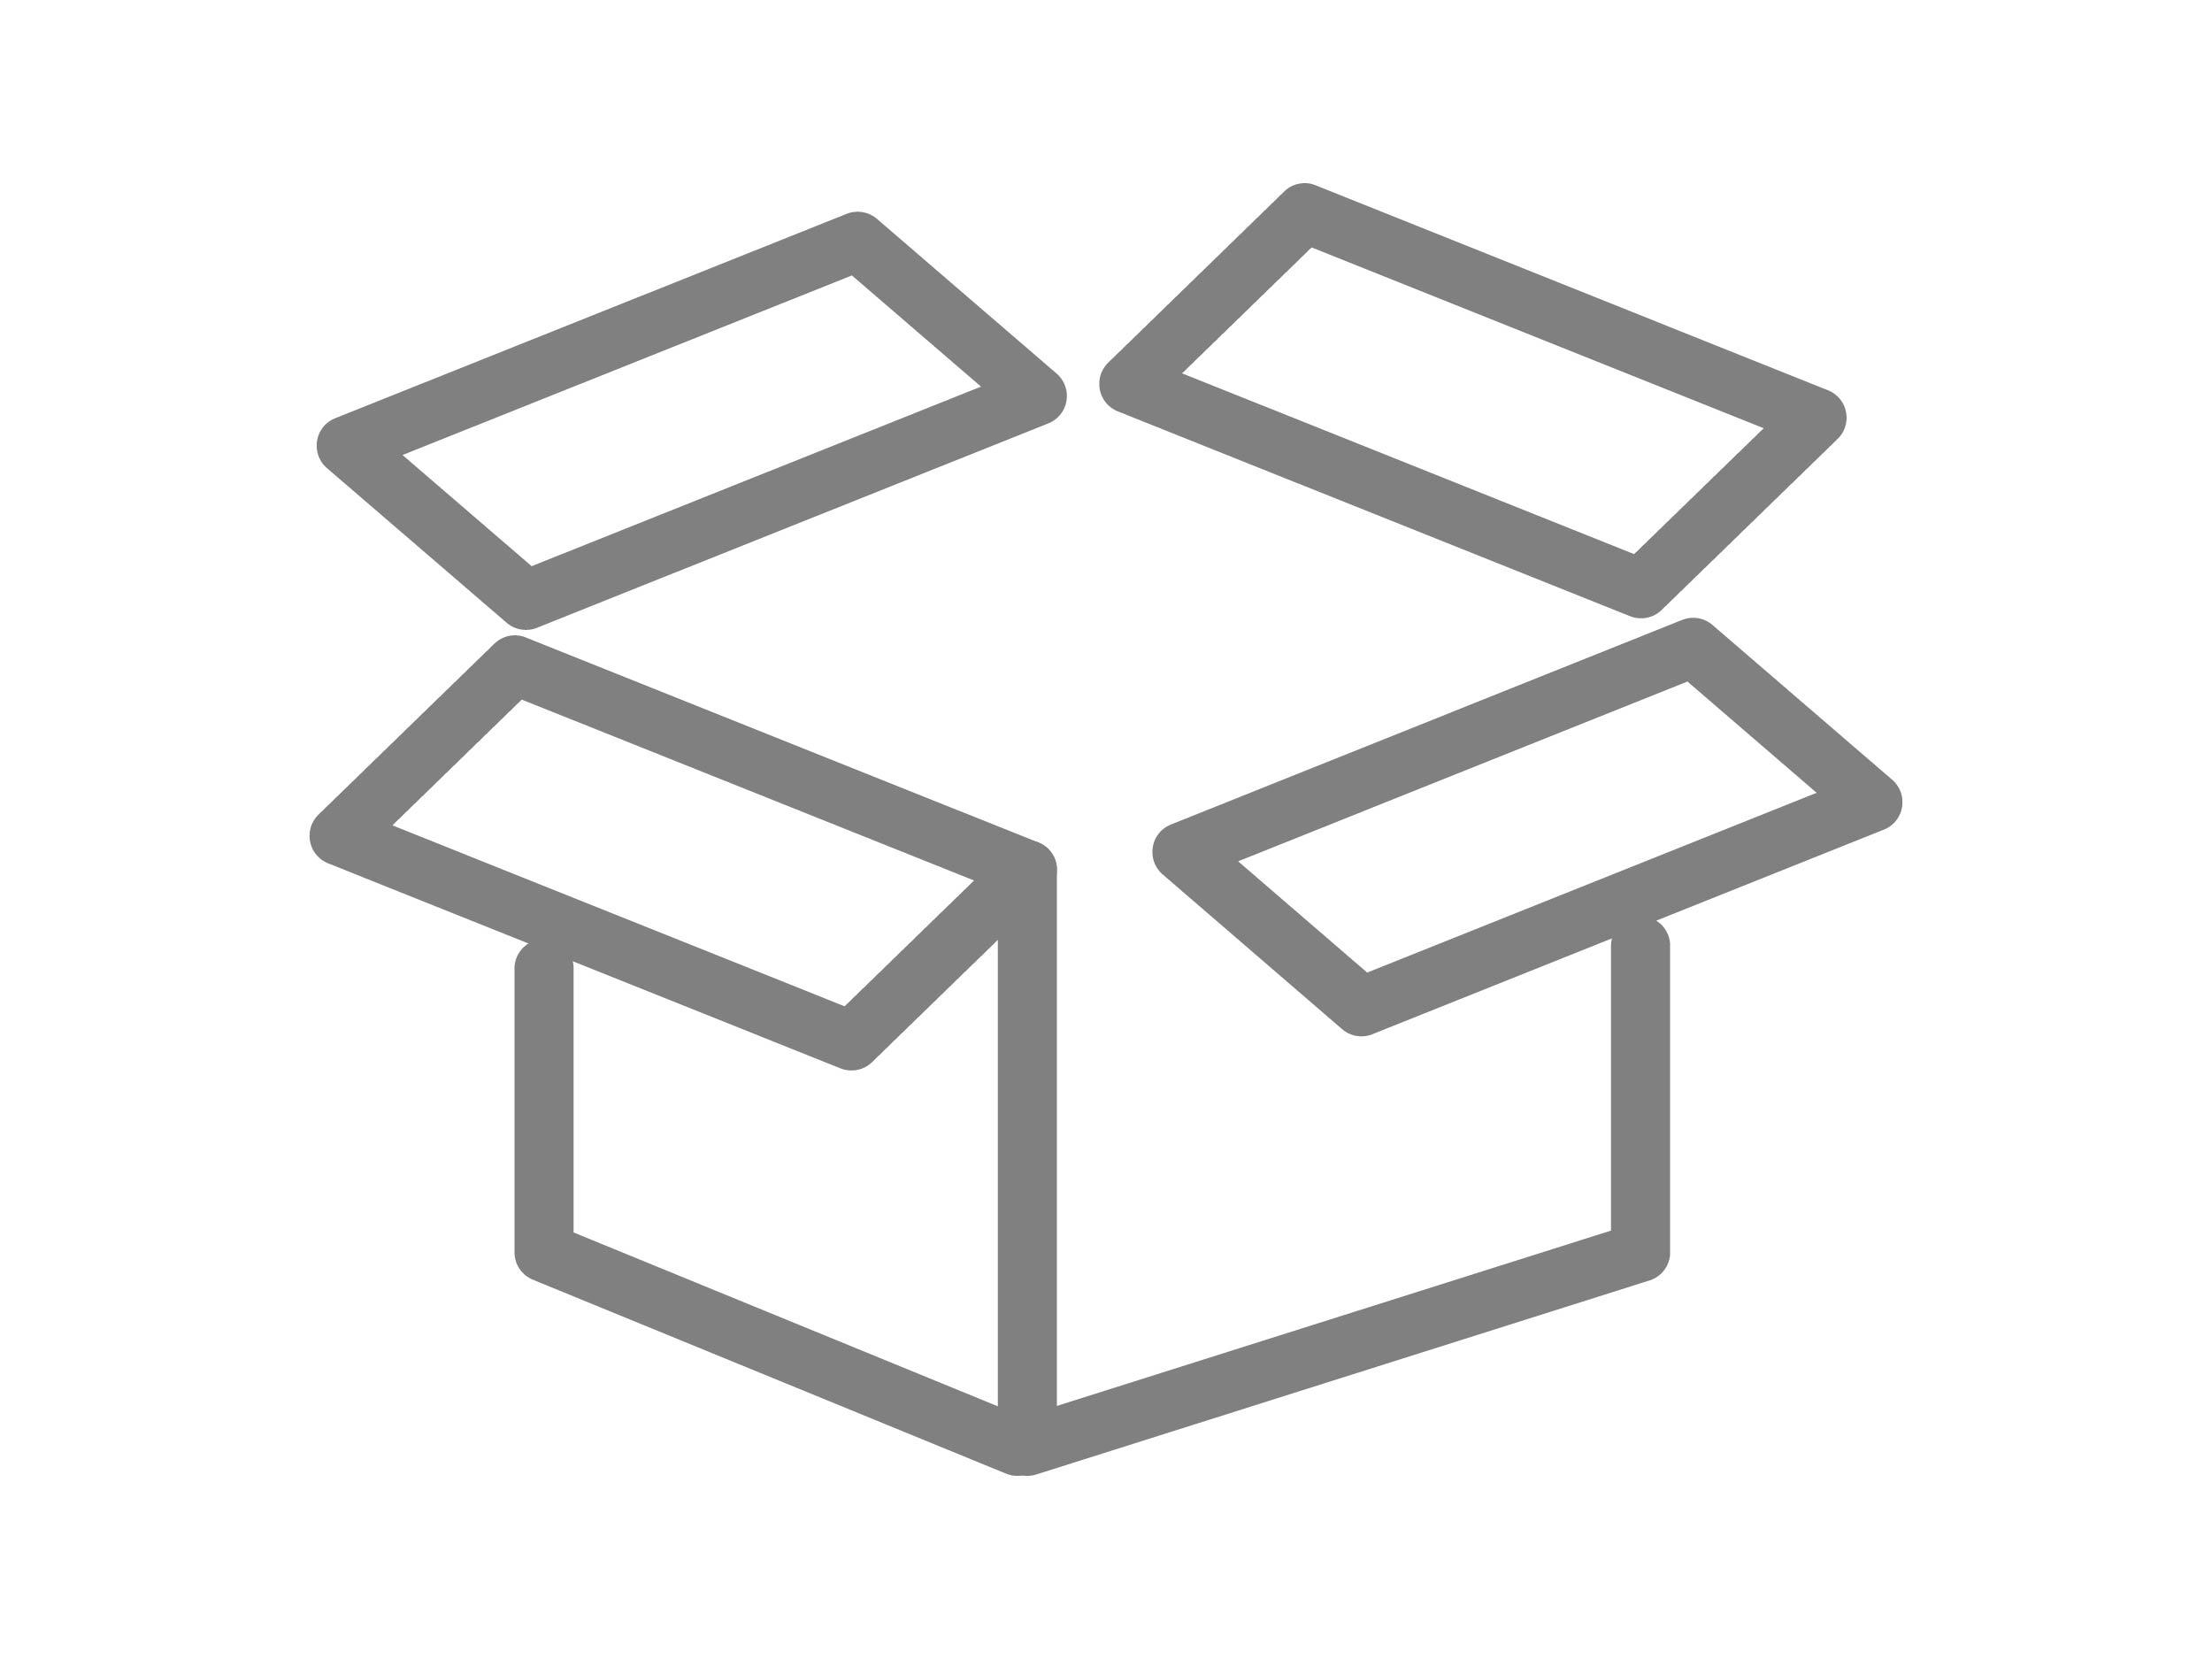 integrations_icon.jpg